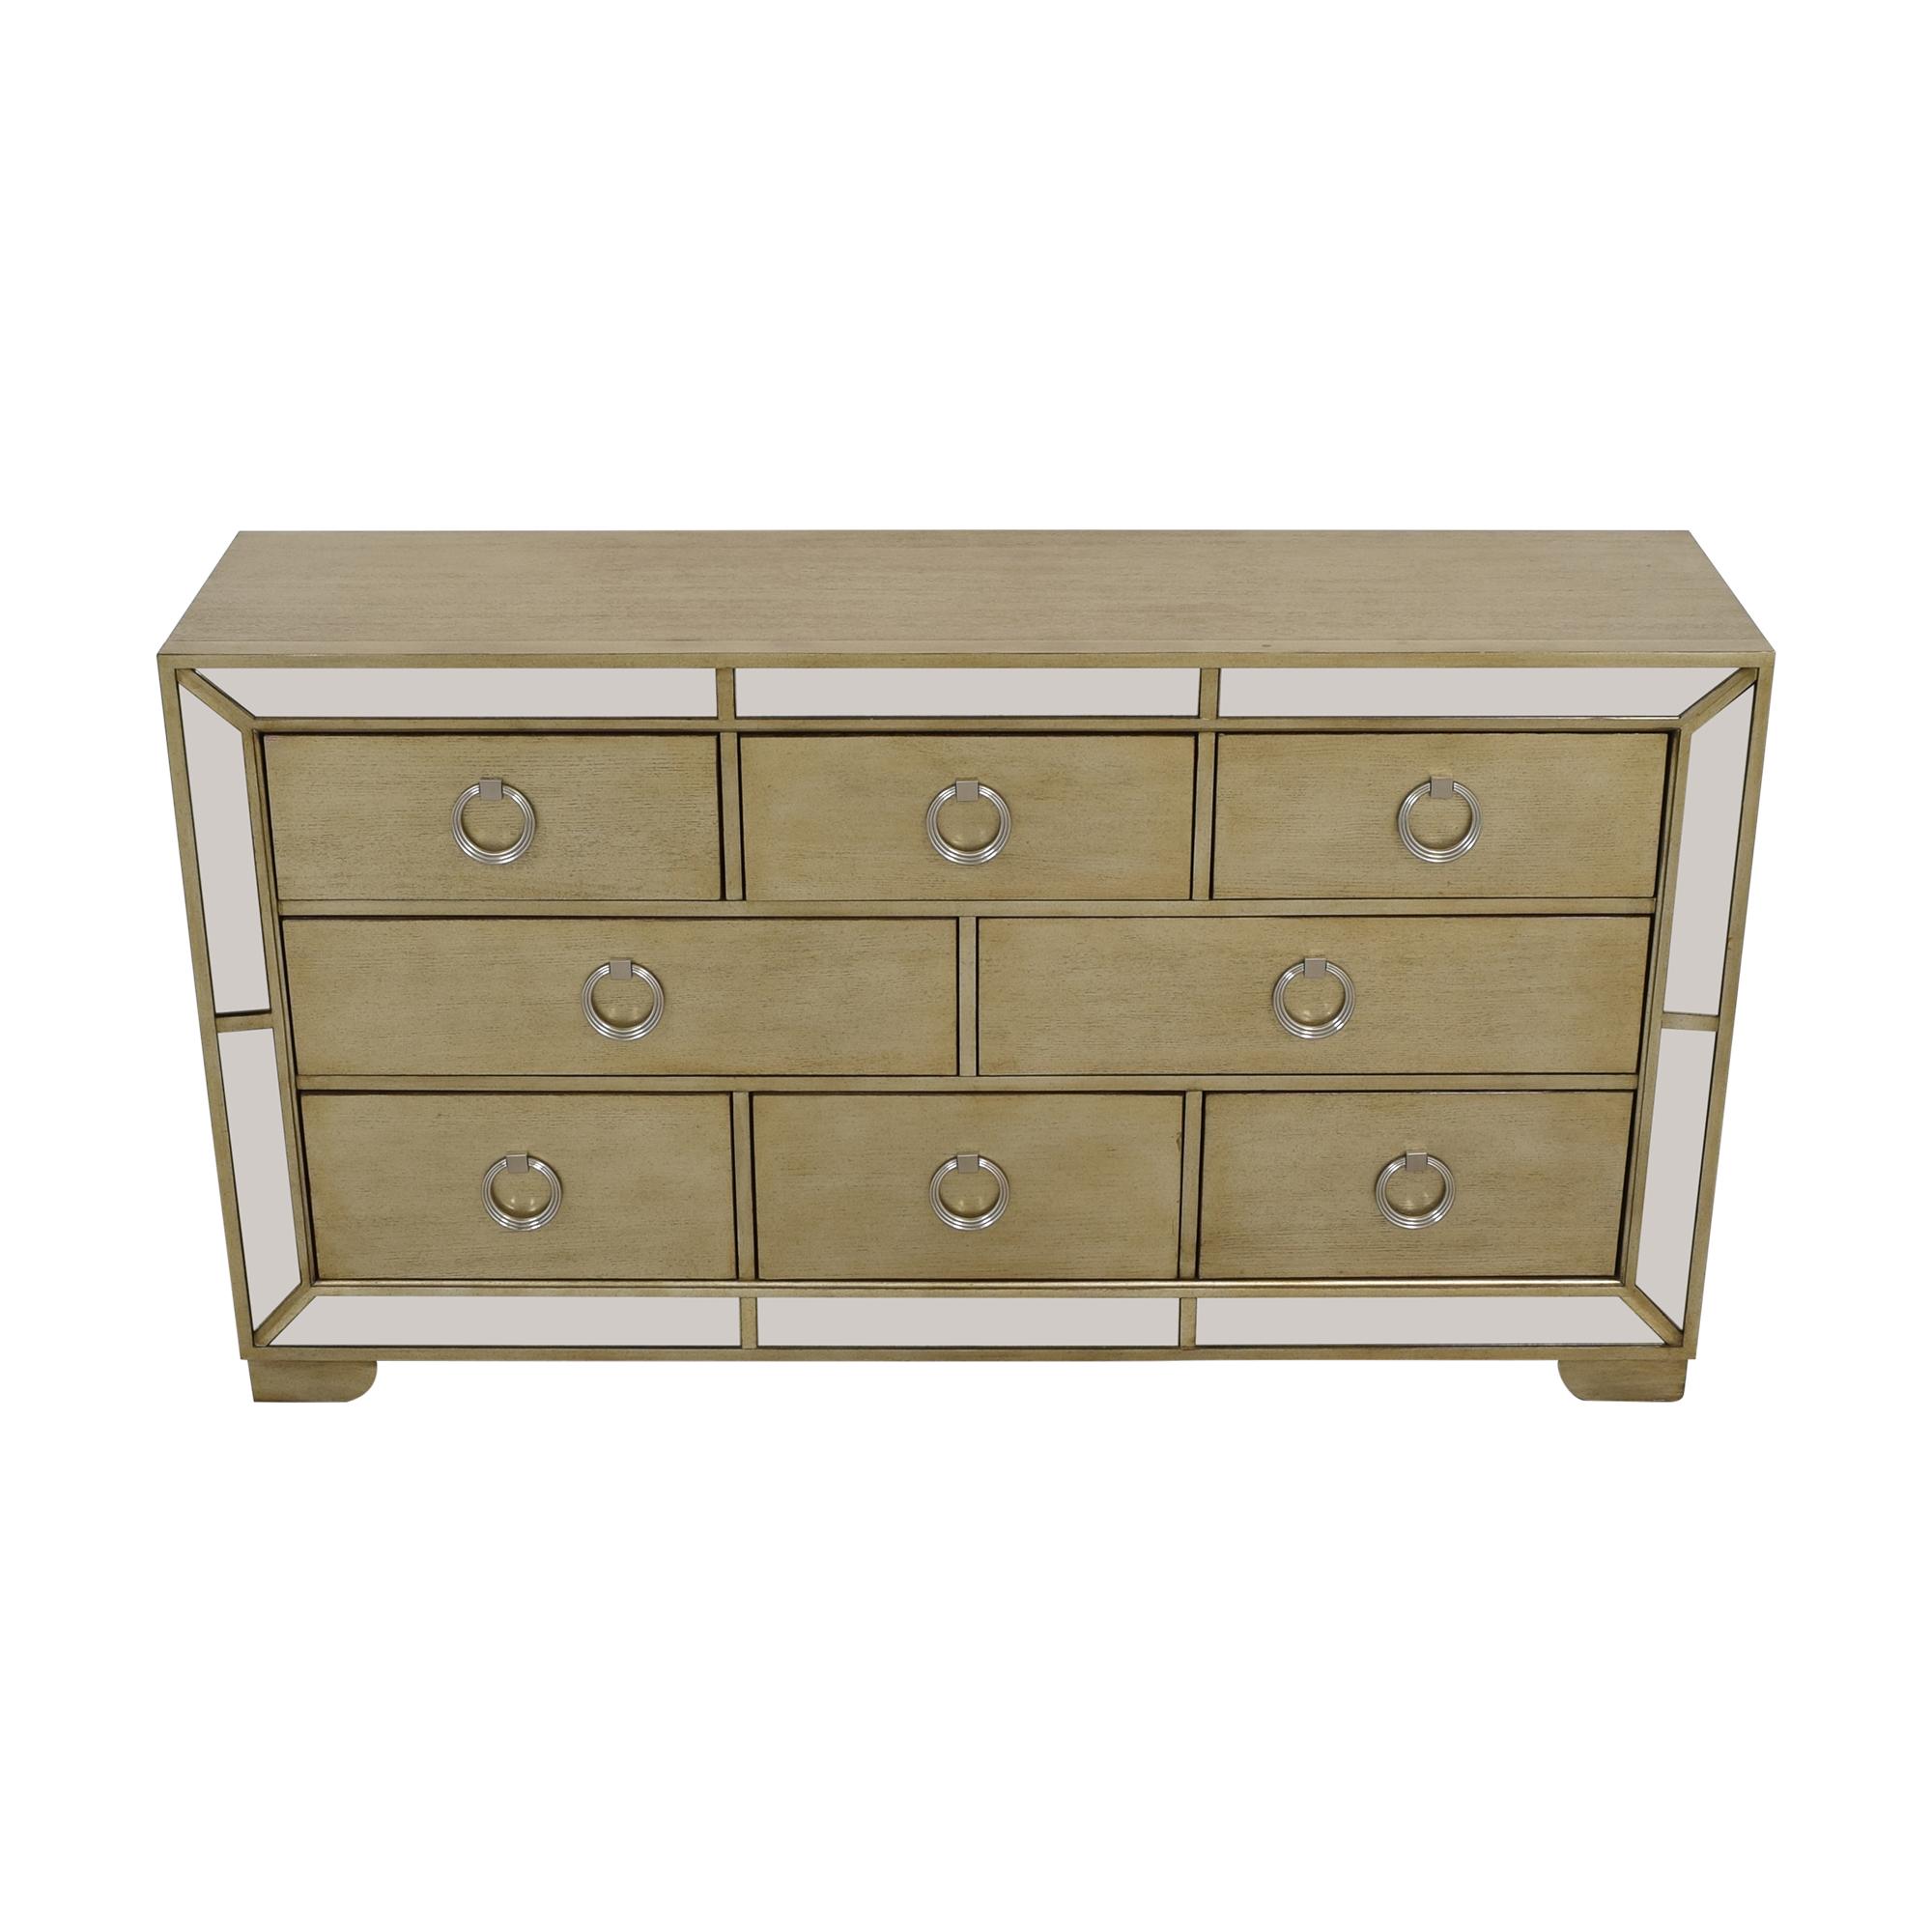 Macy's Ailey Eight Drawer Dresser Macy's